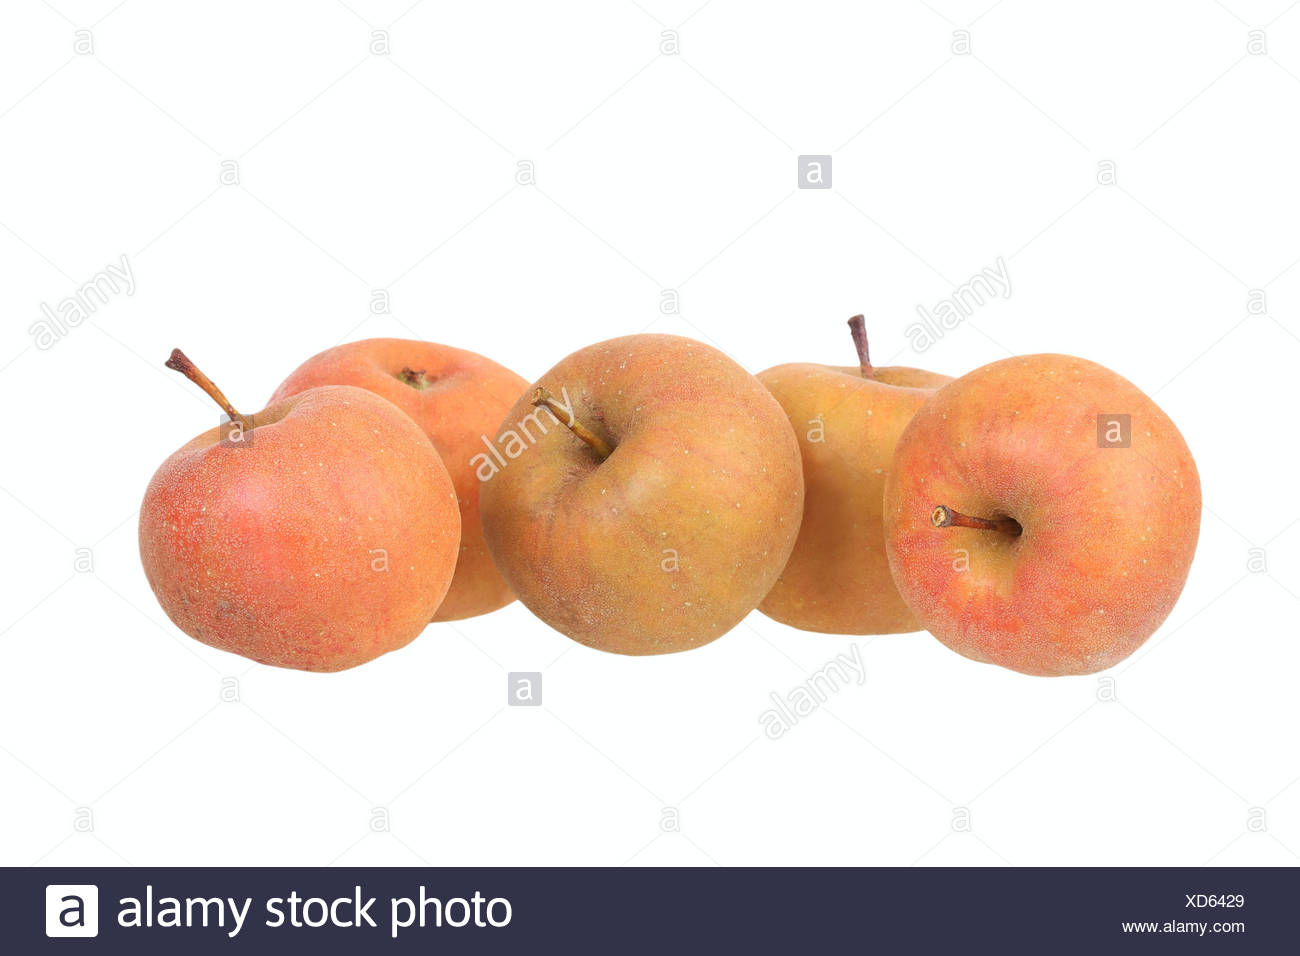 Apples, Carputin variety, traditional sort for producing cider - Stock Image